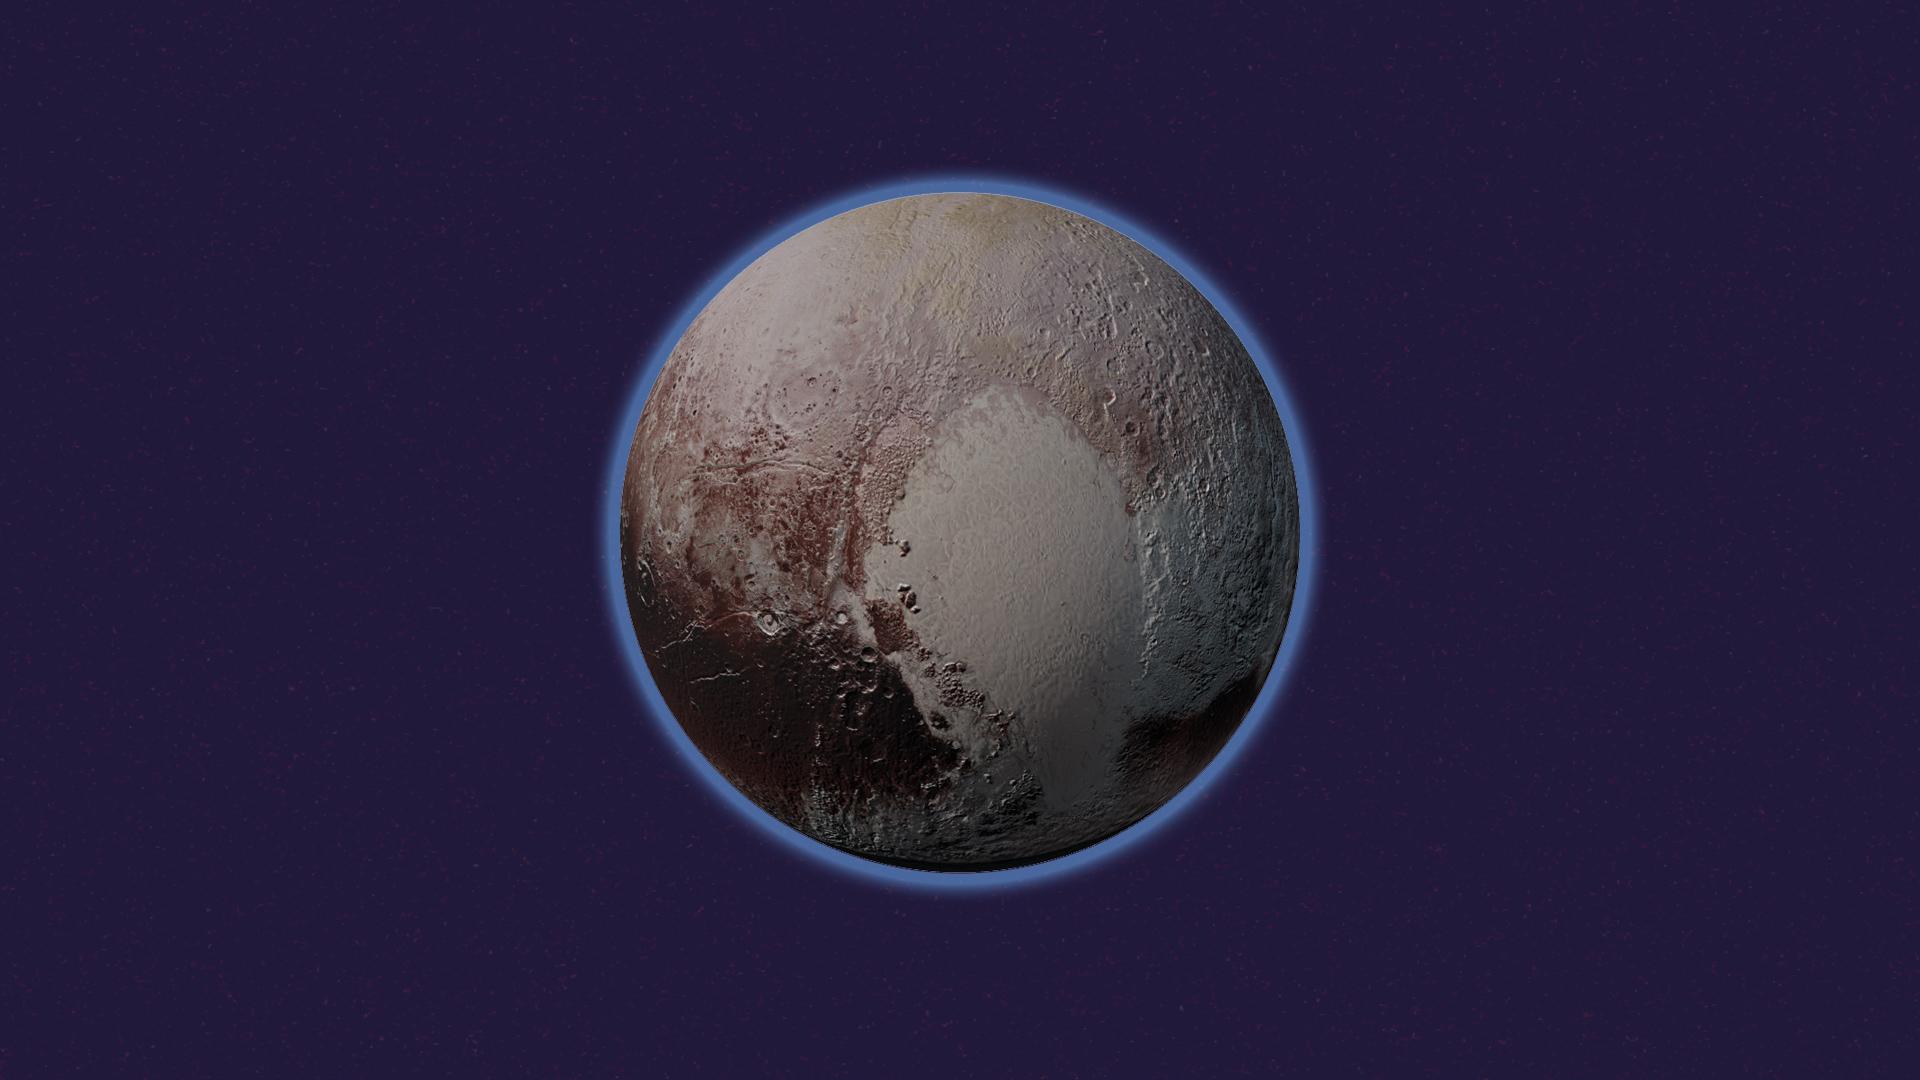 enhanced color mercury map nasa solar system exploration - HD1920×1080